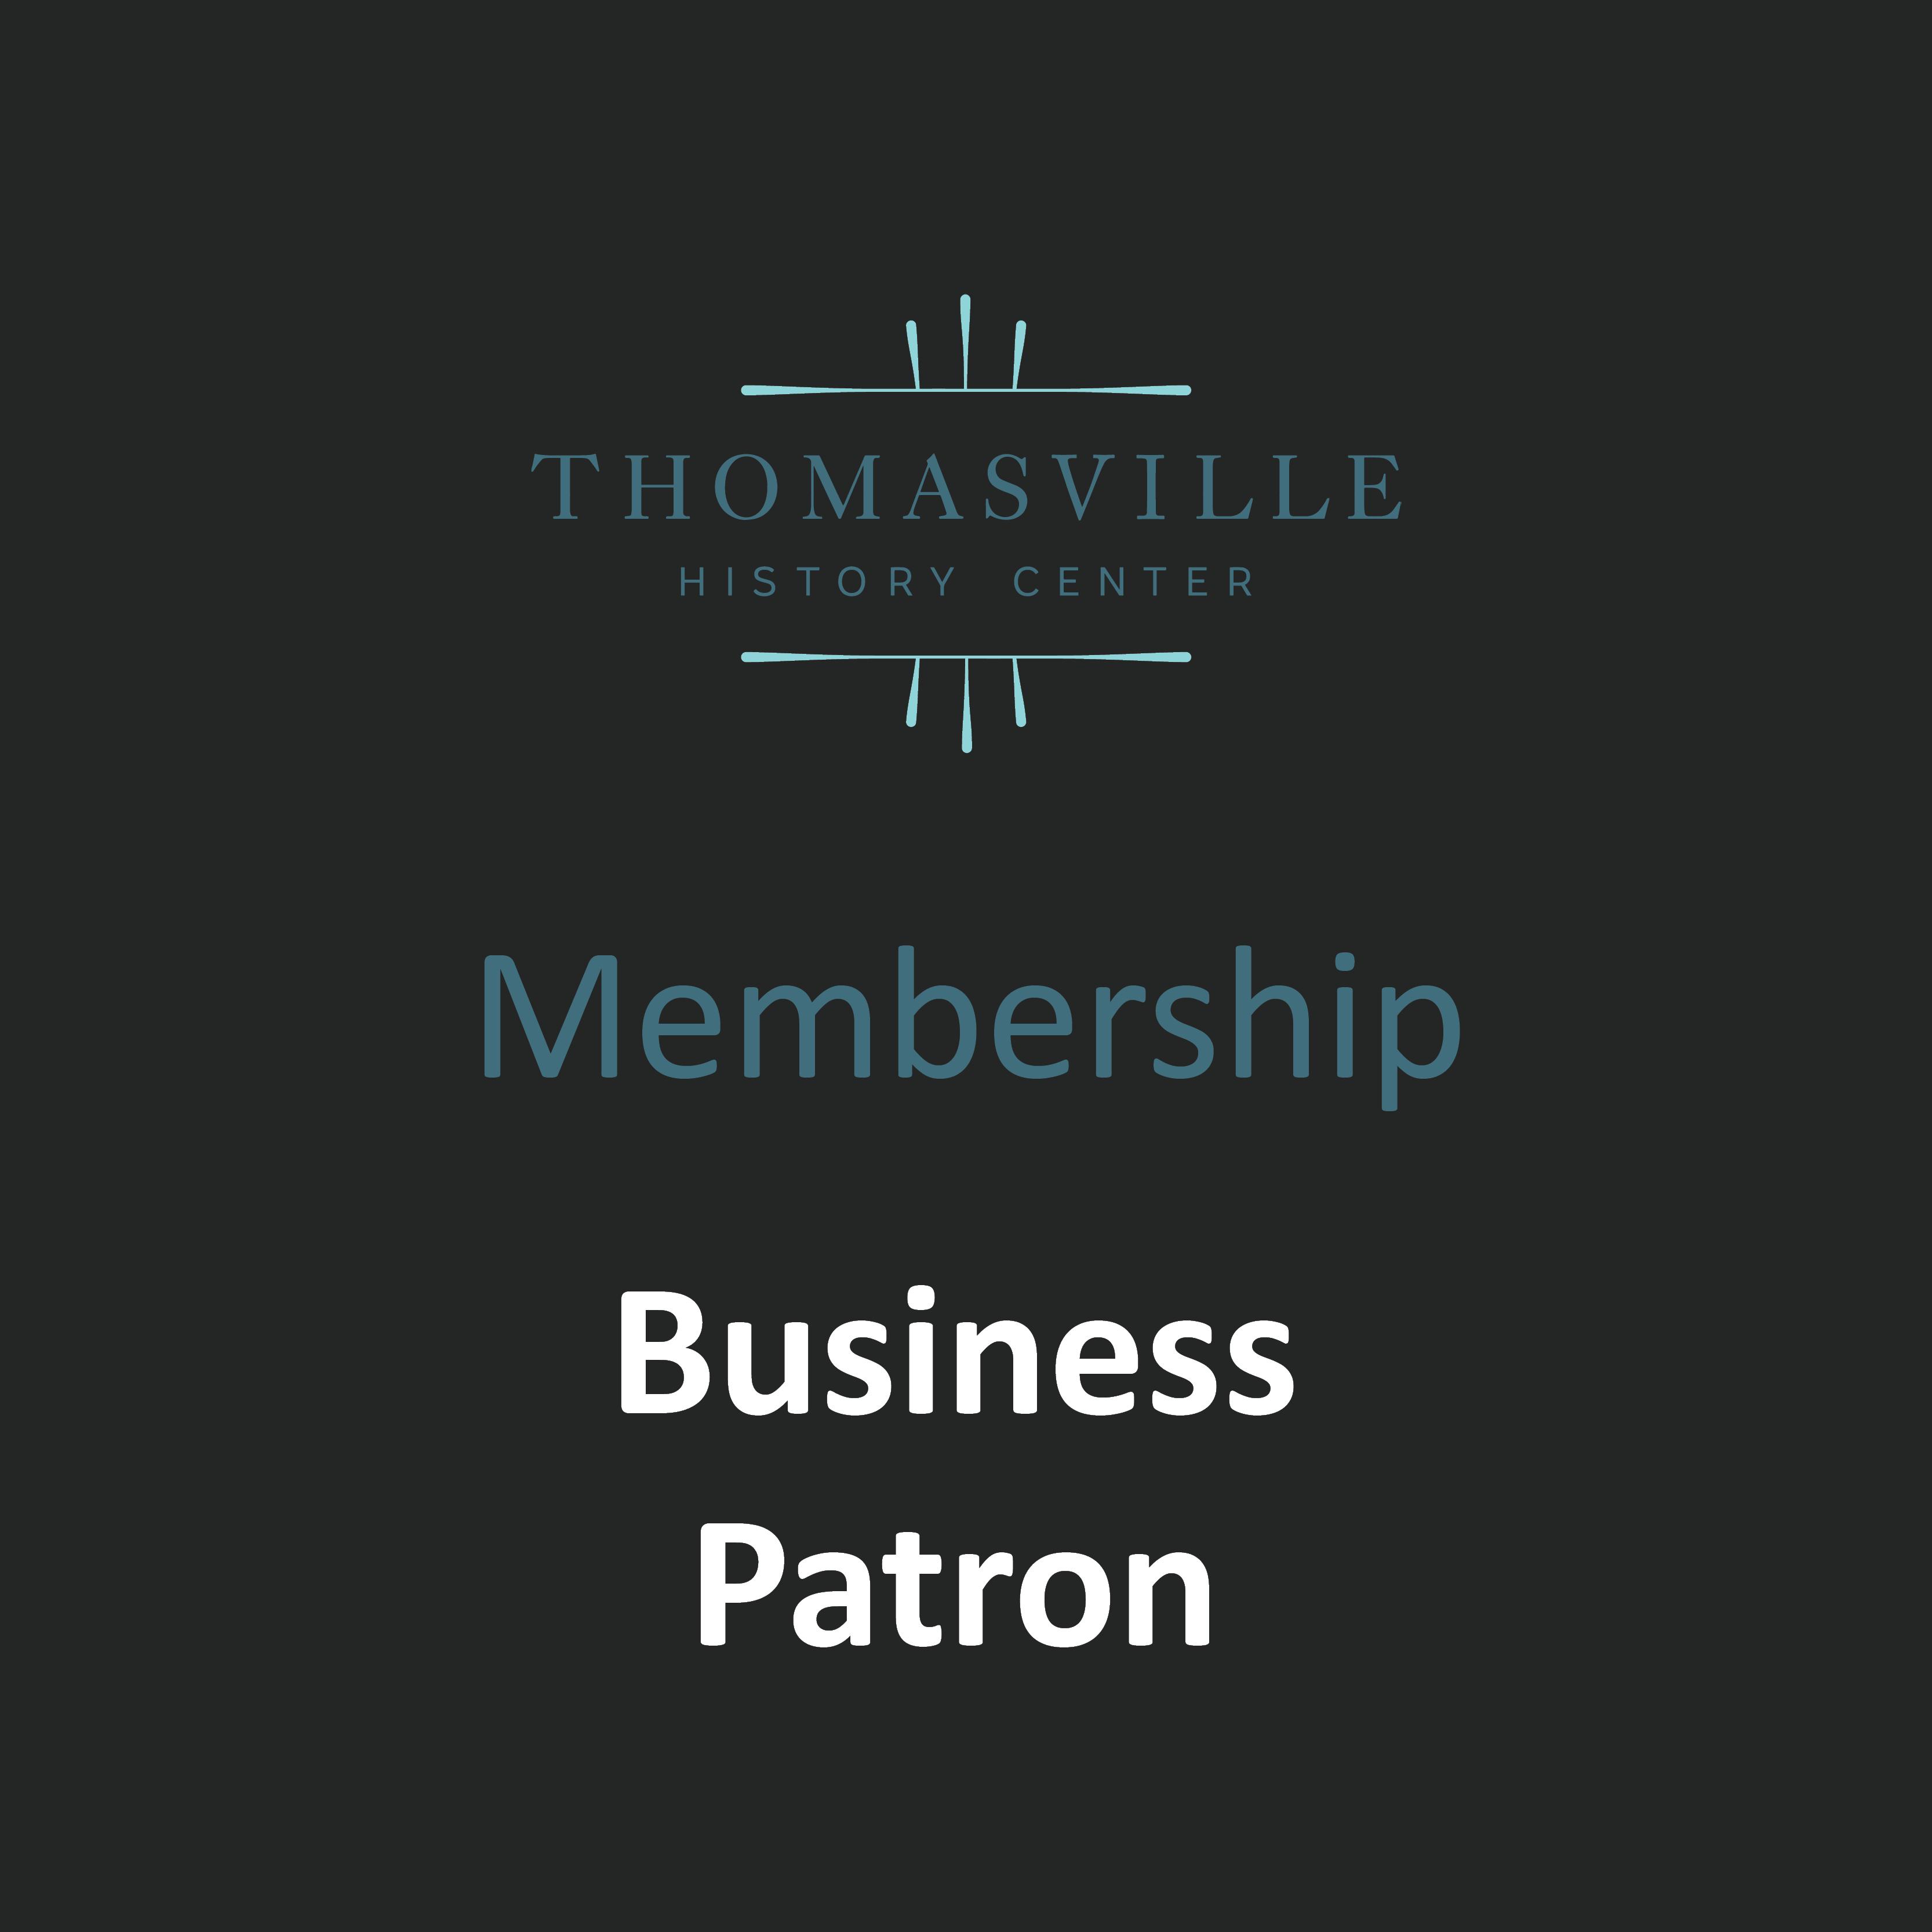 business patron